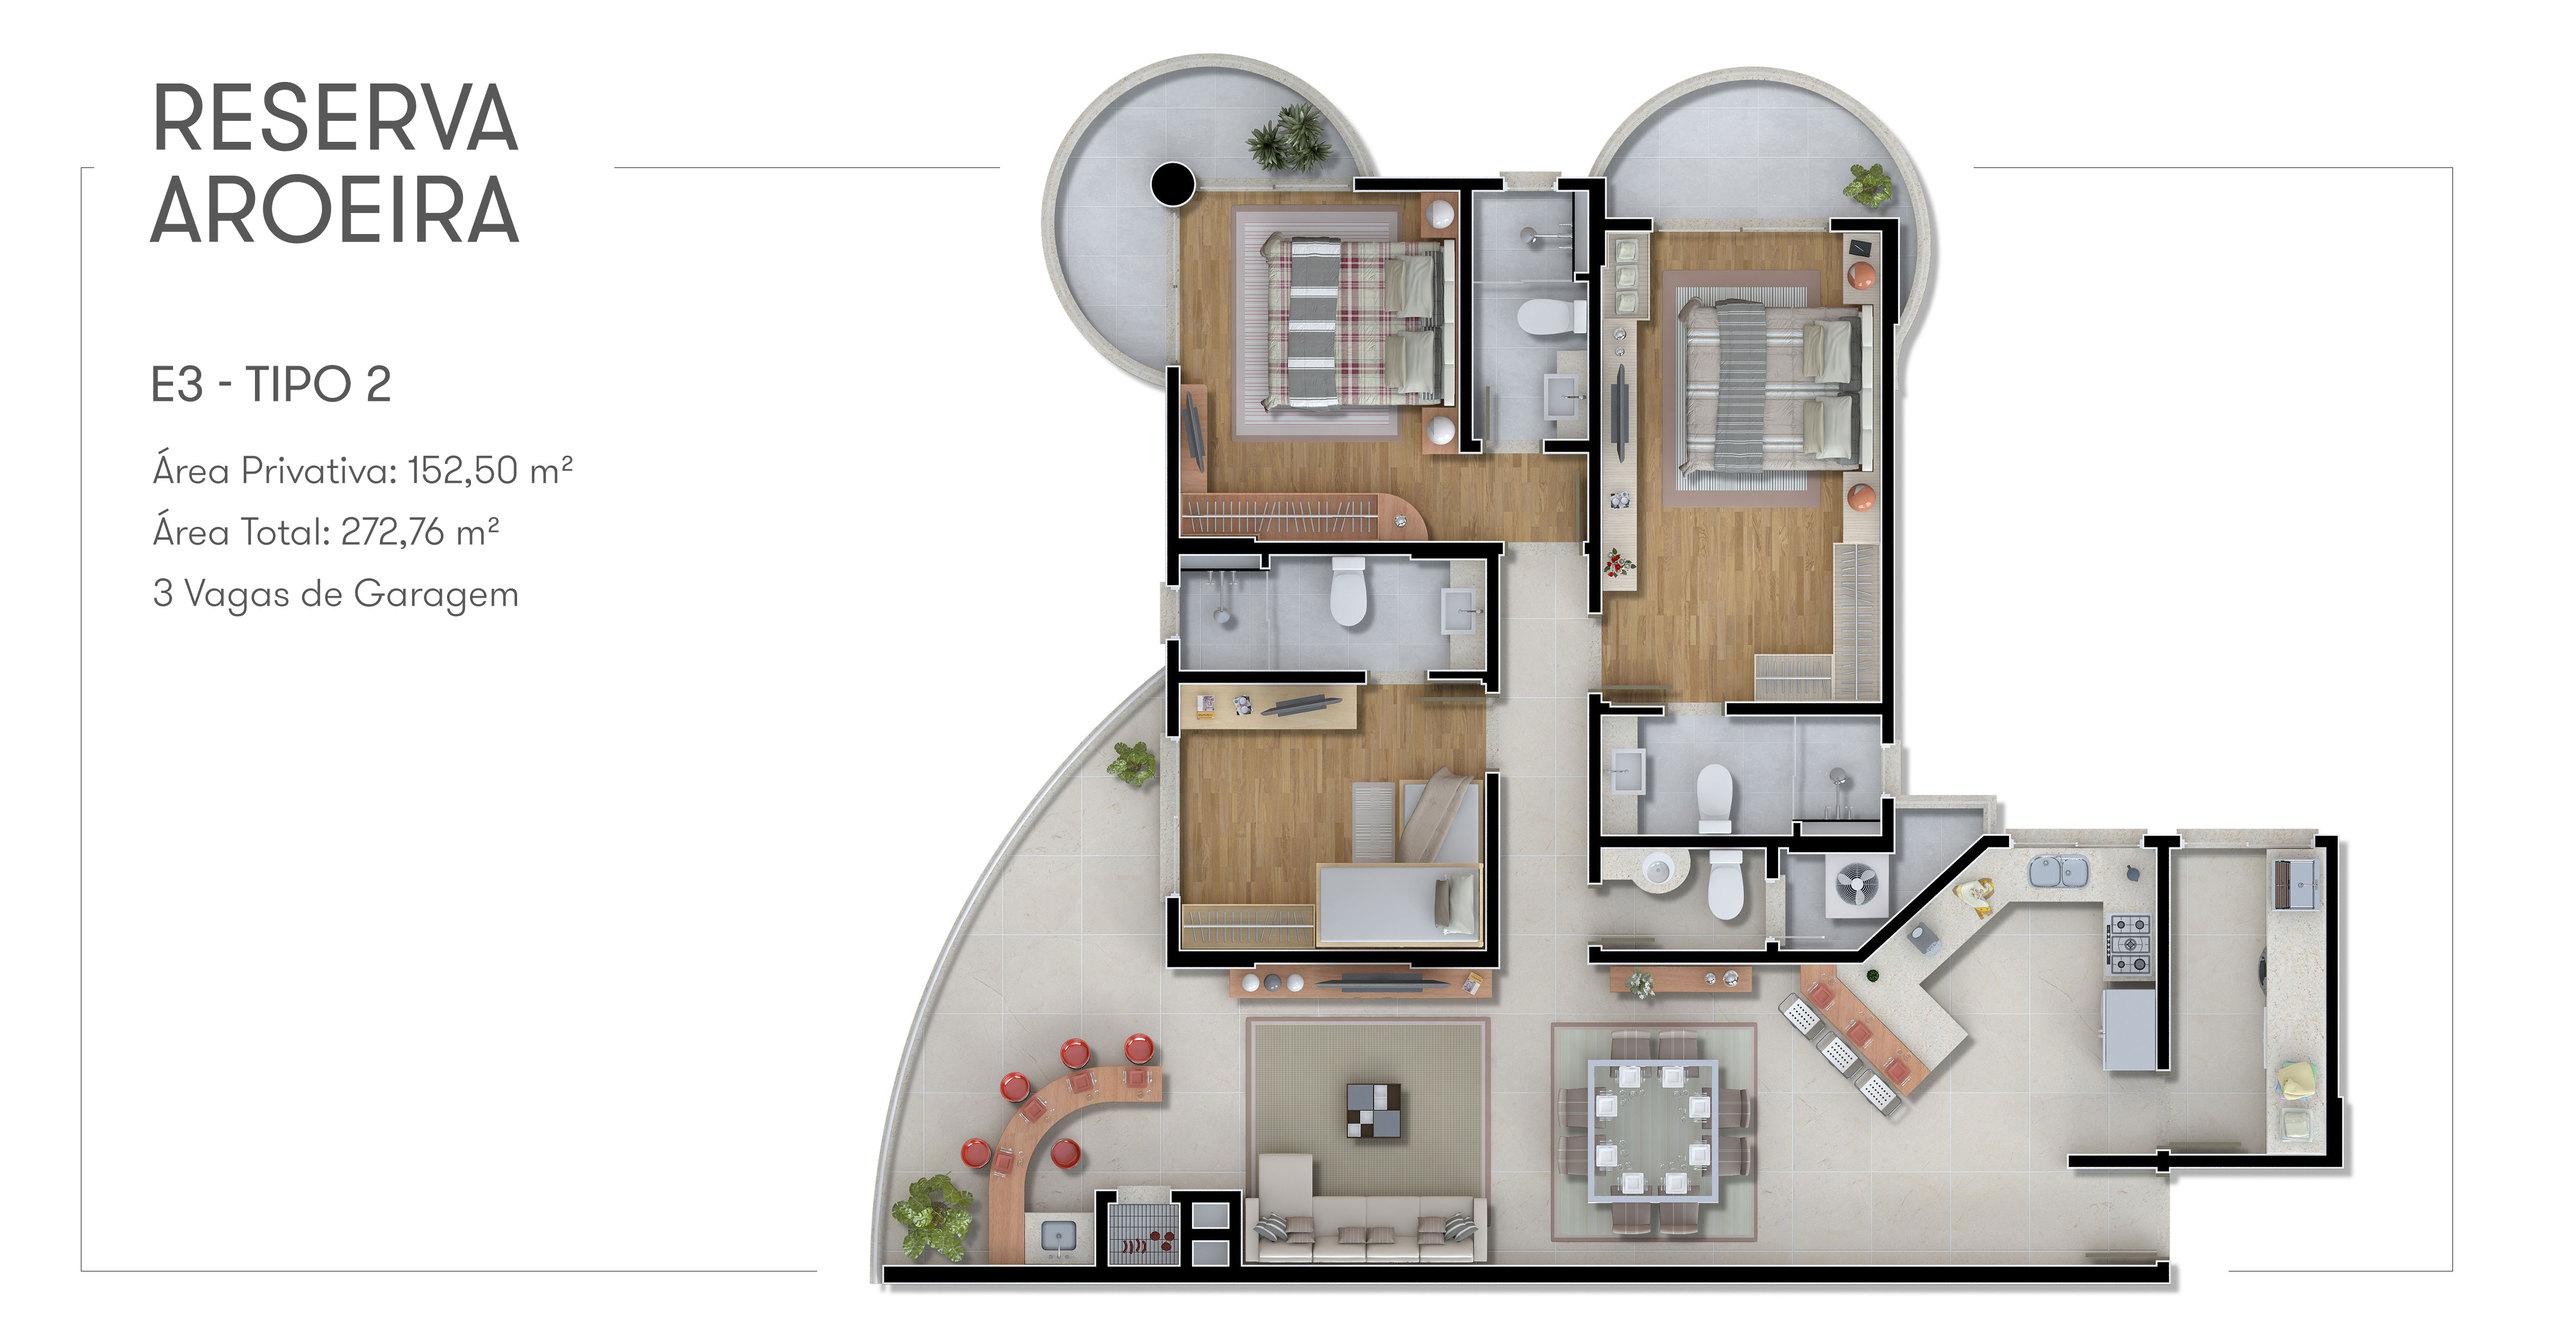 Reserva Aroeira - Apartamento Tipo